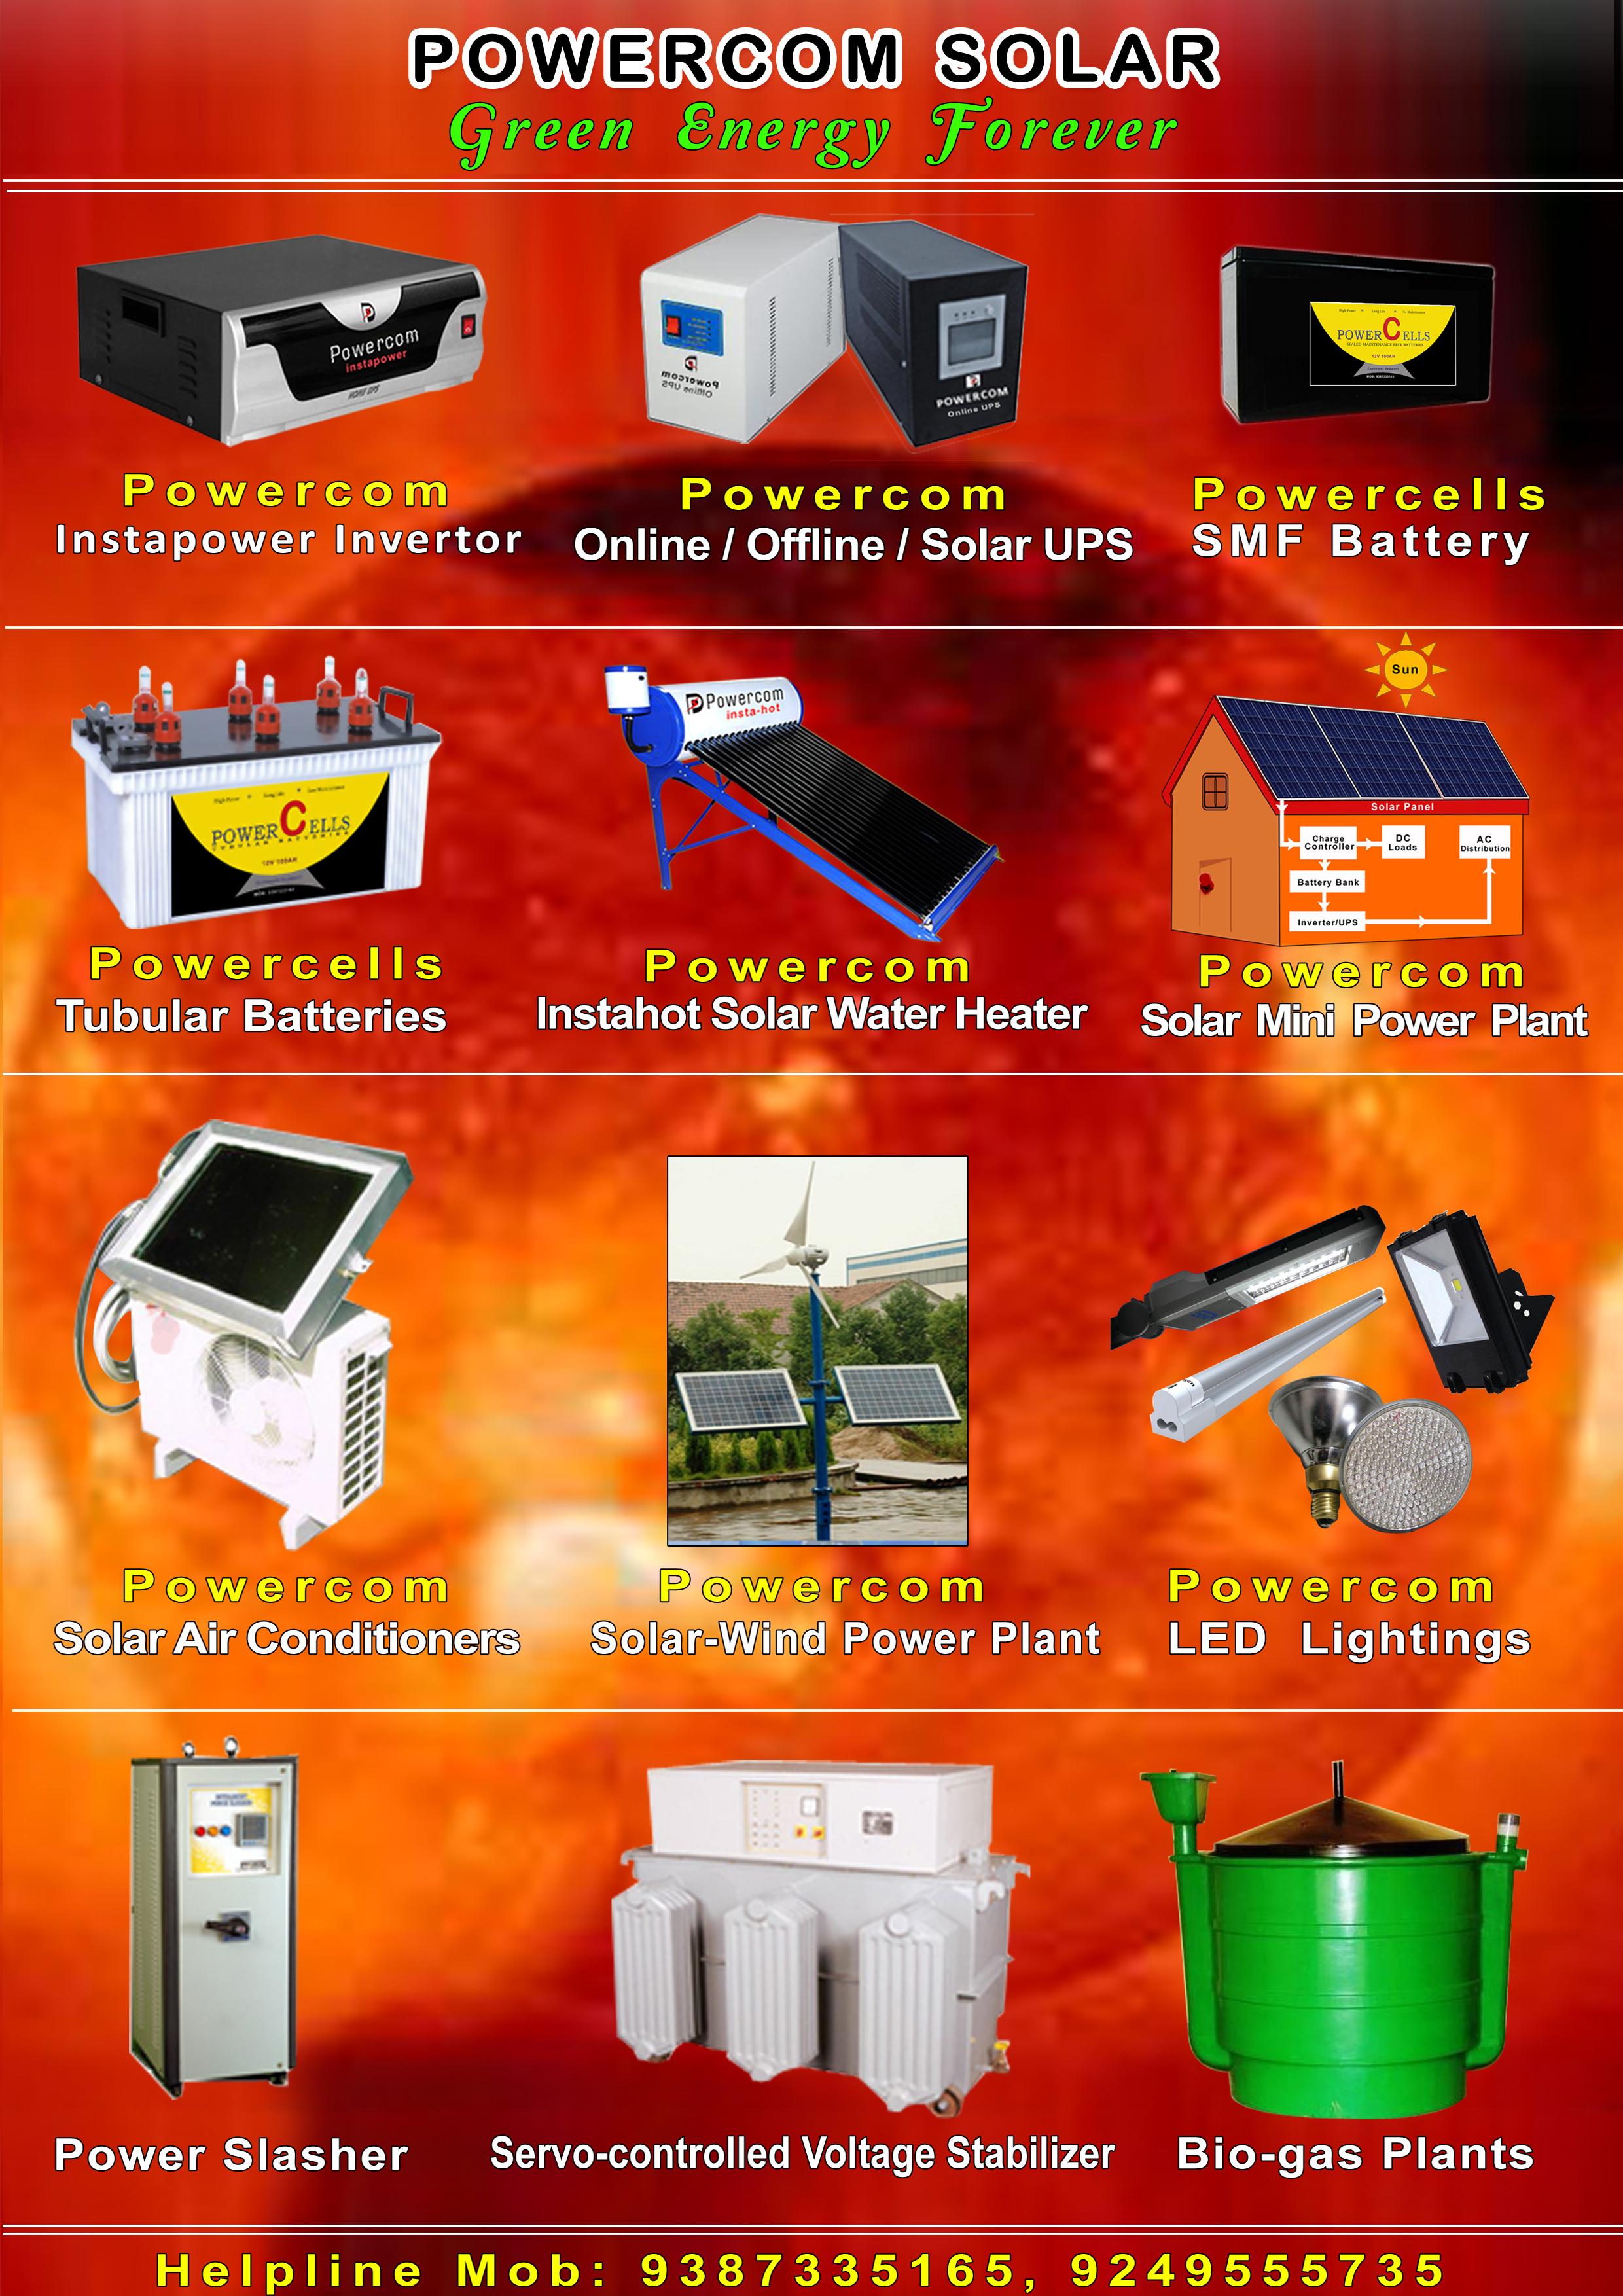 Powercom Solar